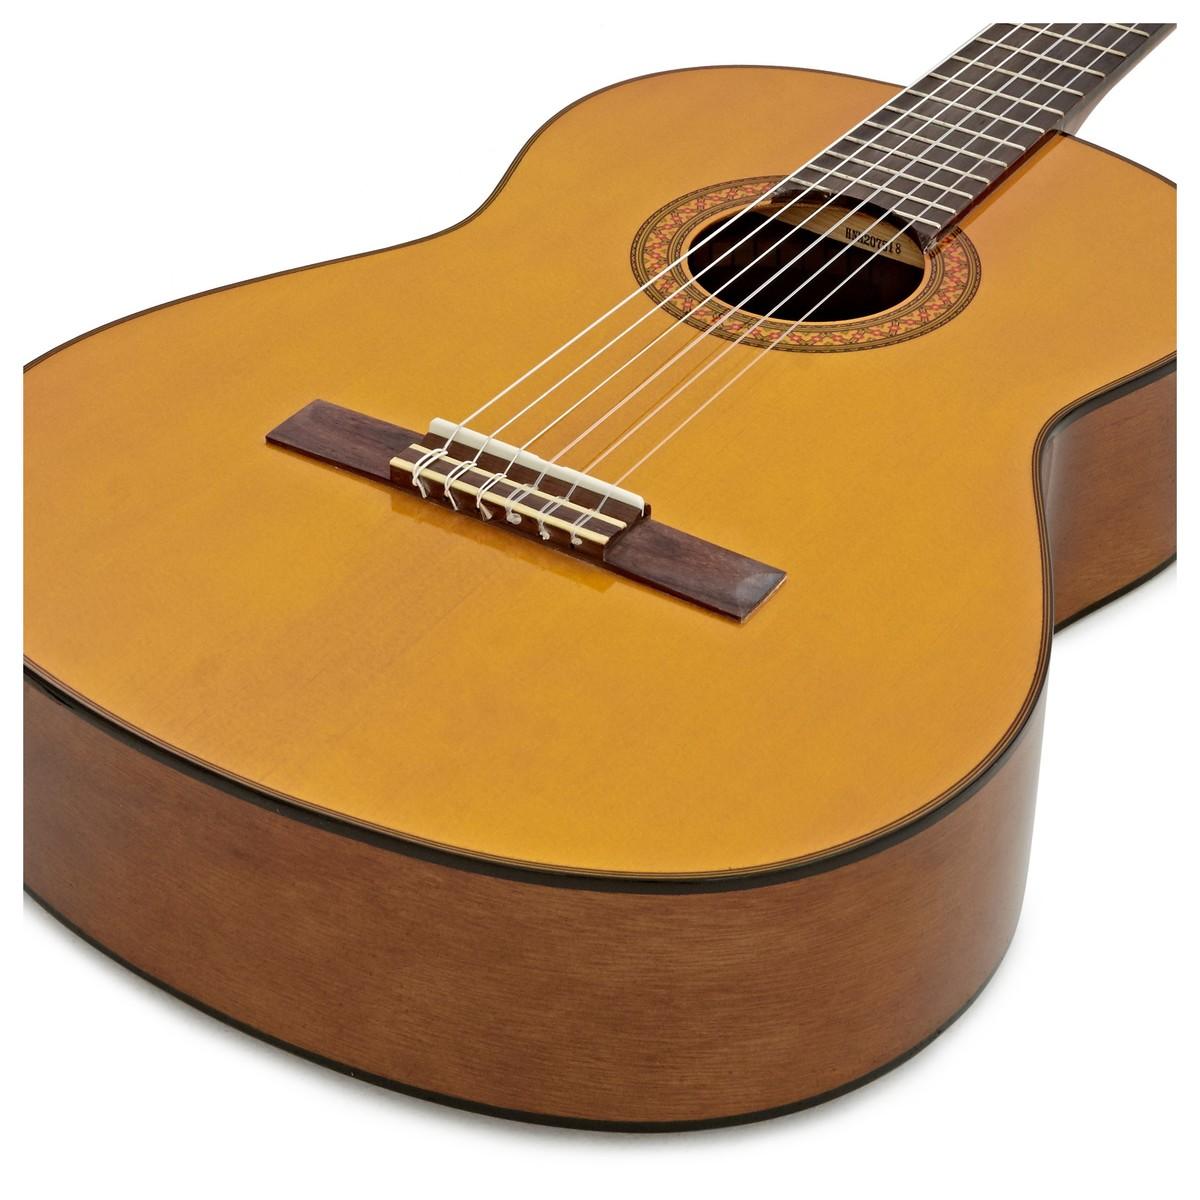 Yamaha C70 Classical Guitar, Natural Gloss at Gear4music